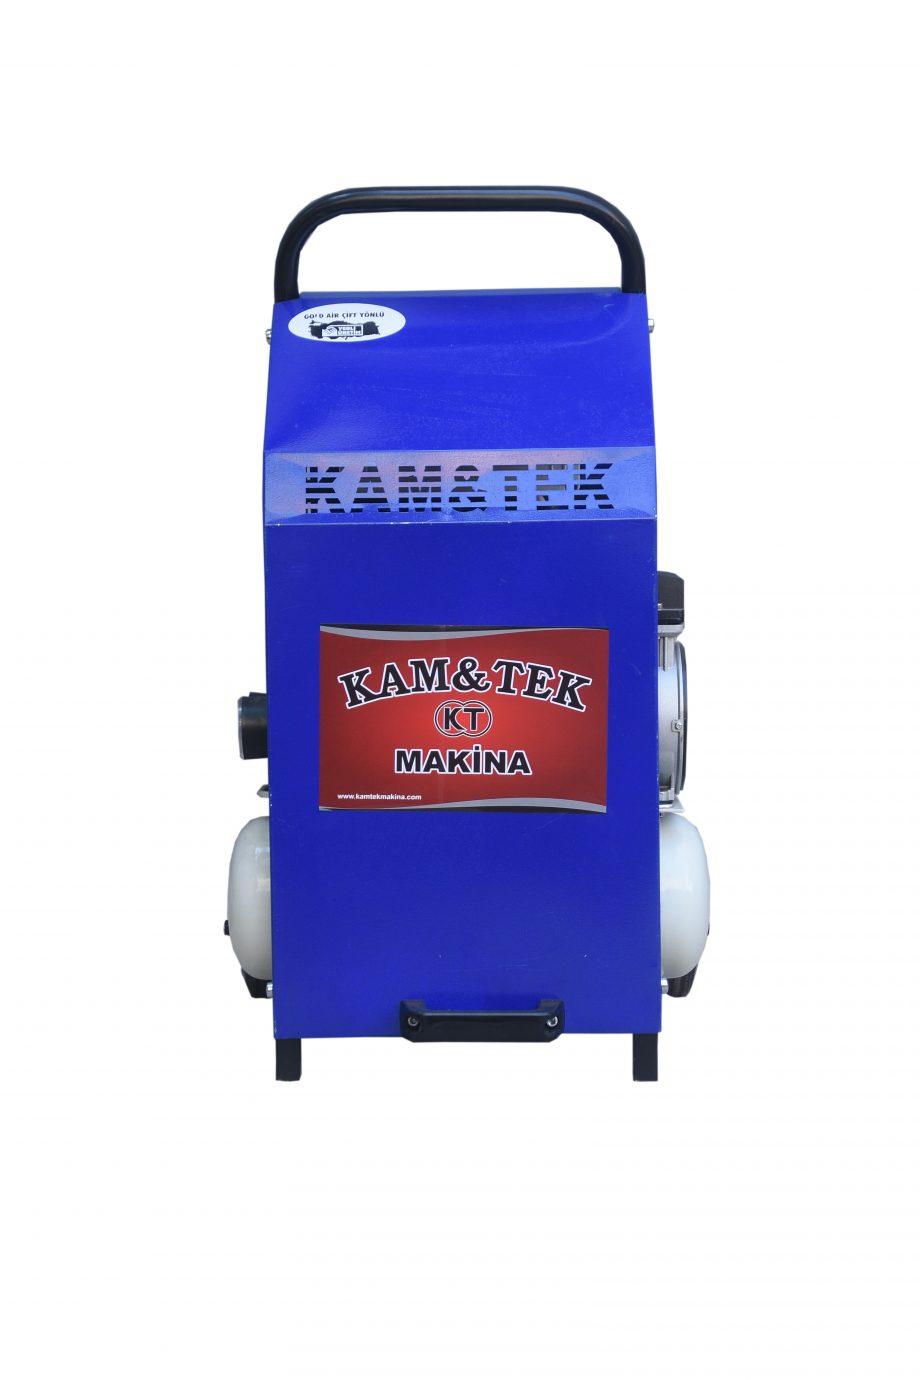 https://www.kamtekmakina.com/wp-content/uploads/2020/11/3-2-scaled.jpg